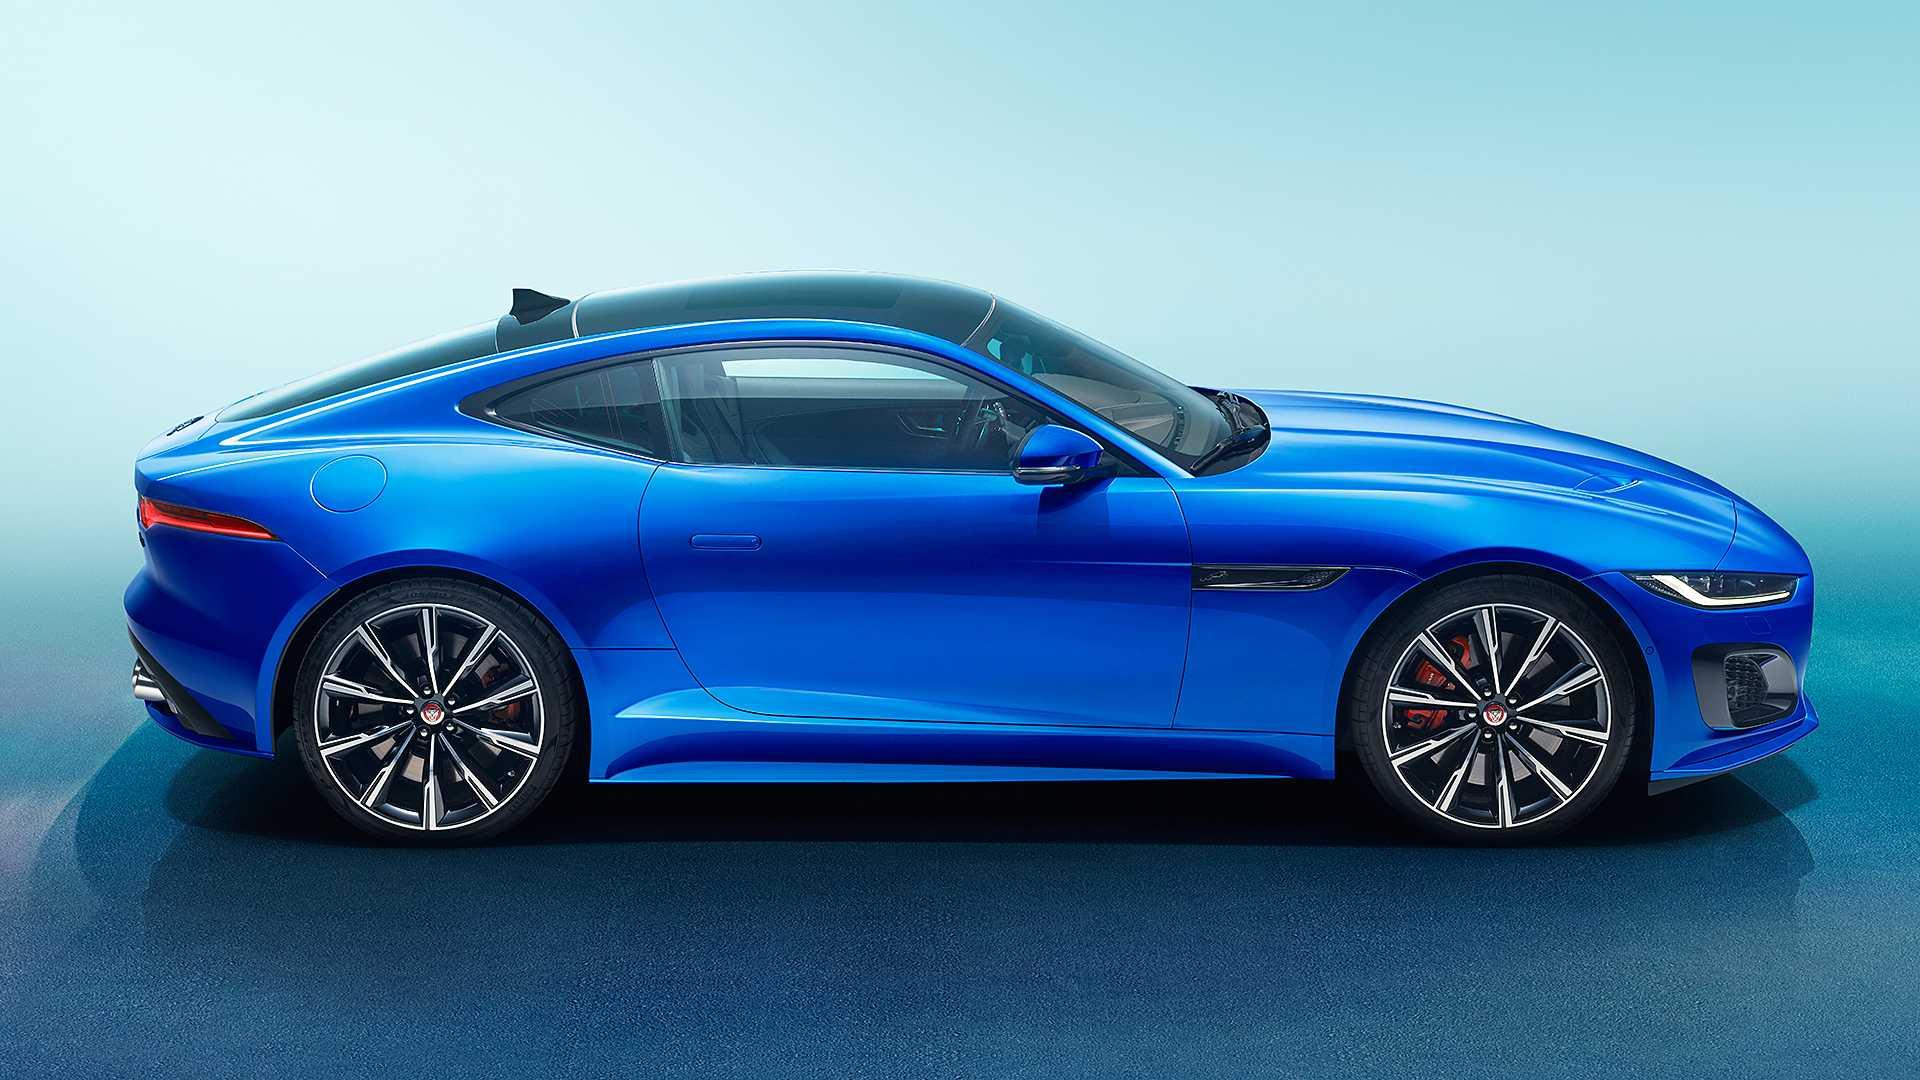 2021-jaguar-f-type-15